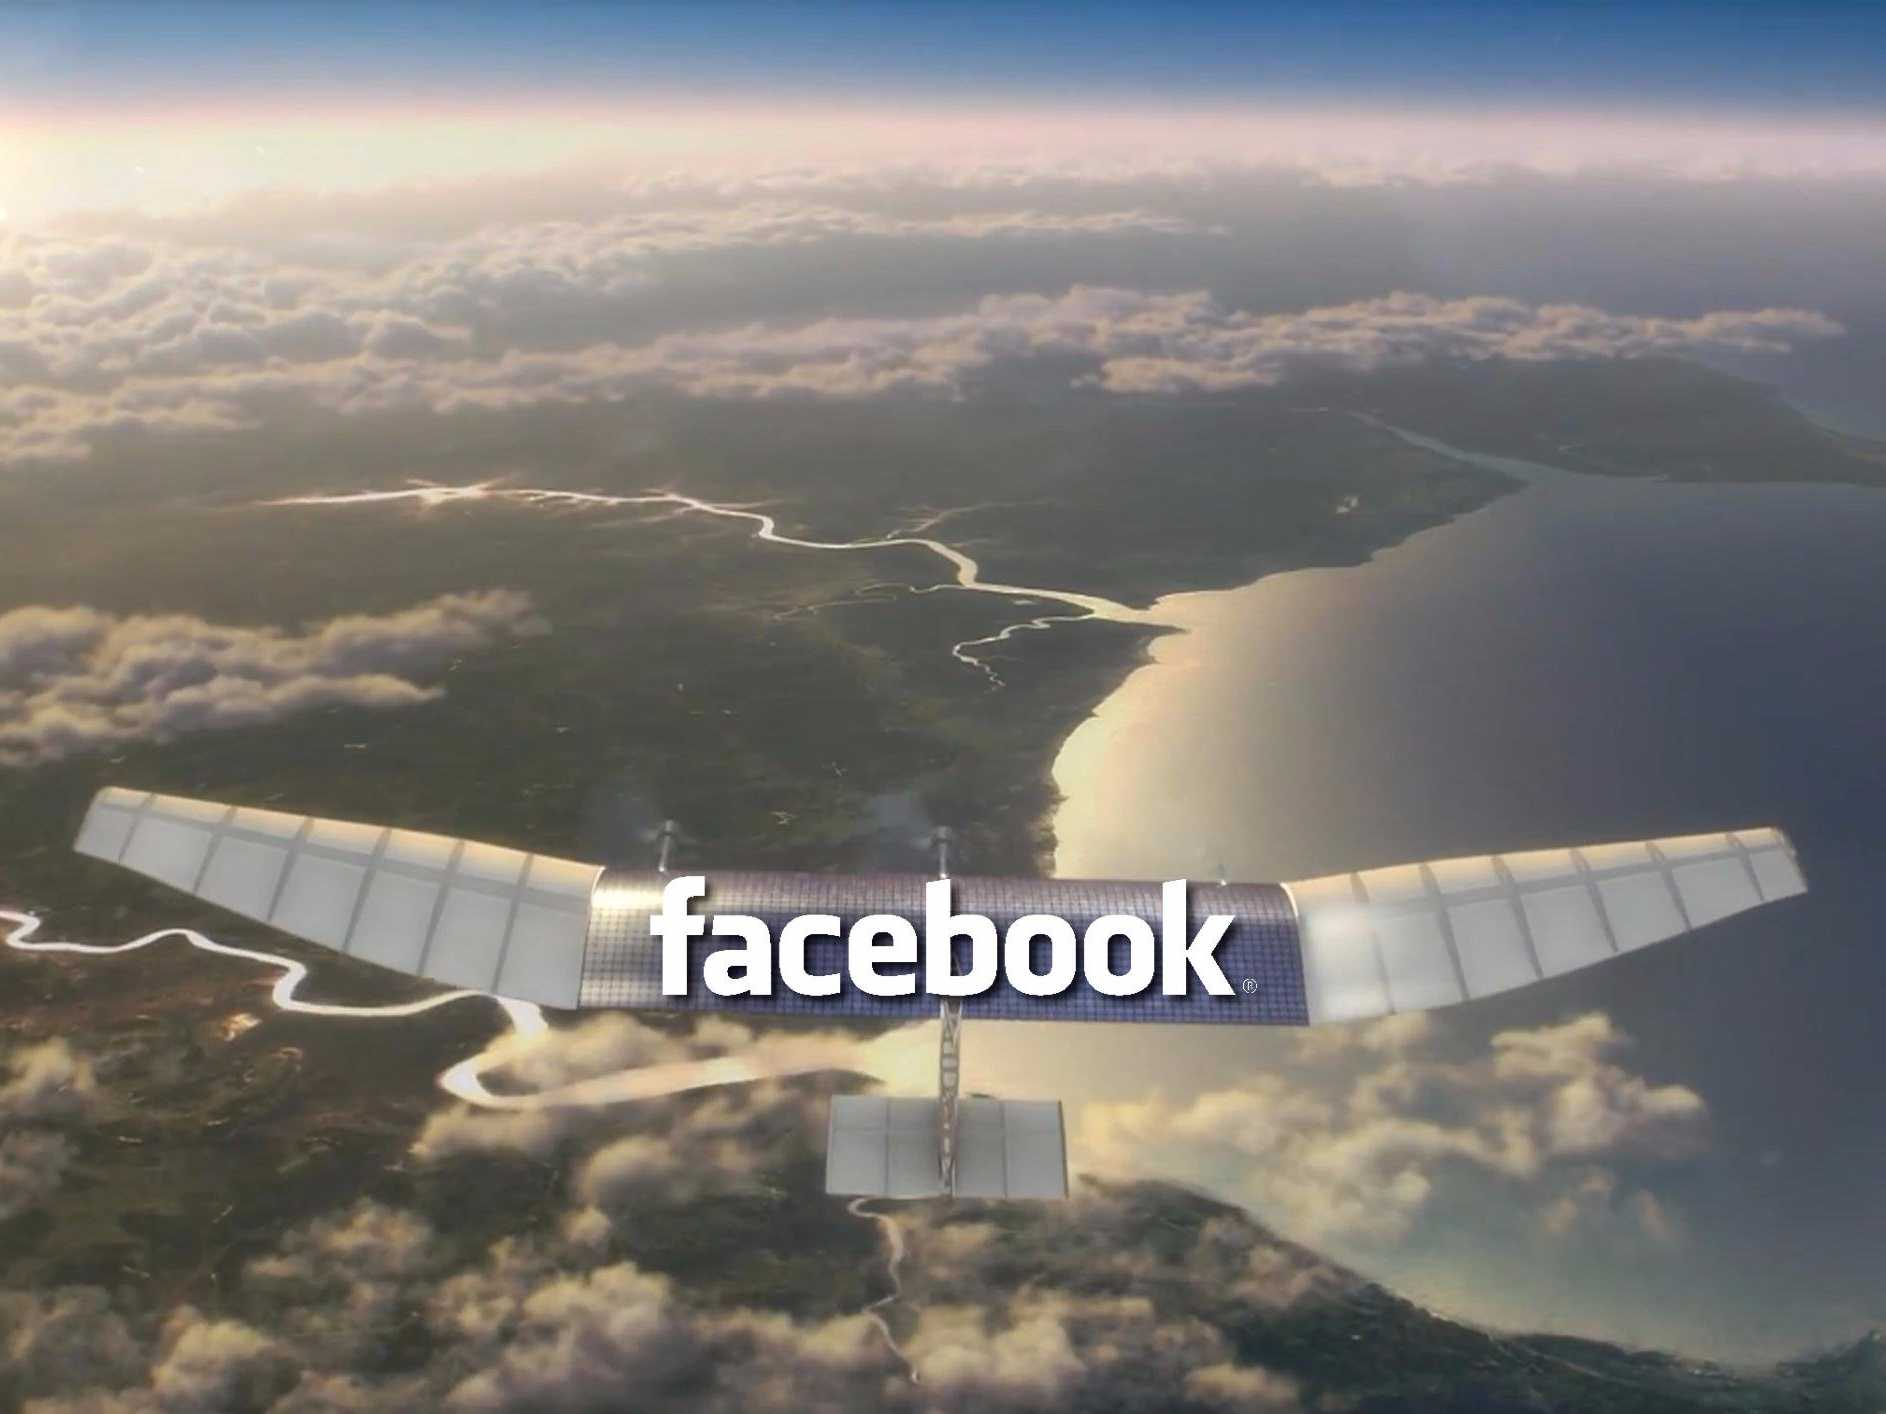 Beş Maddeyle Facebook'un Yeni Dronu Aquila